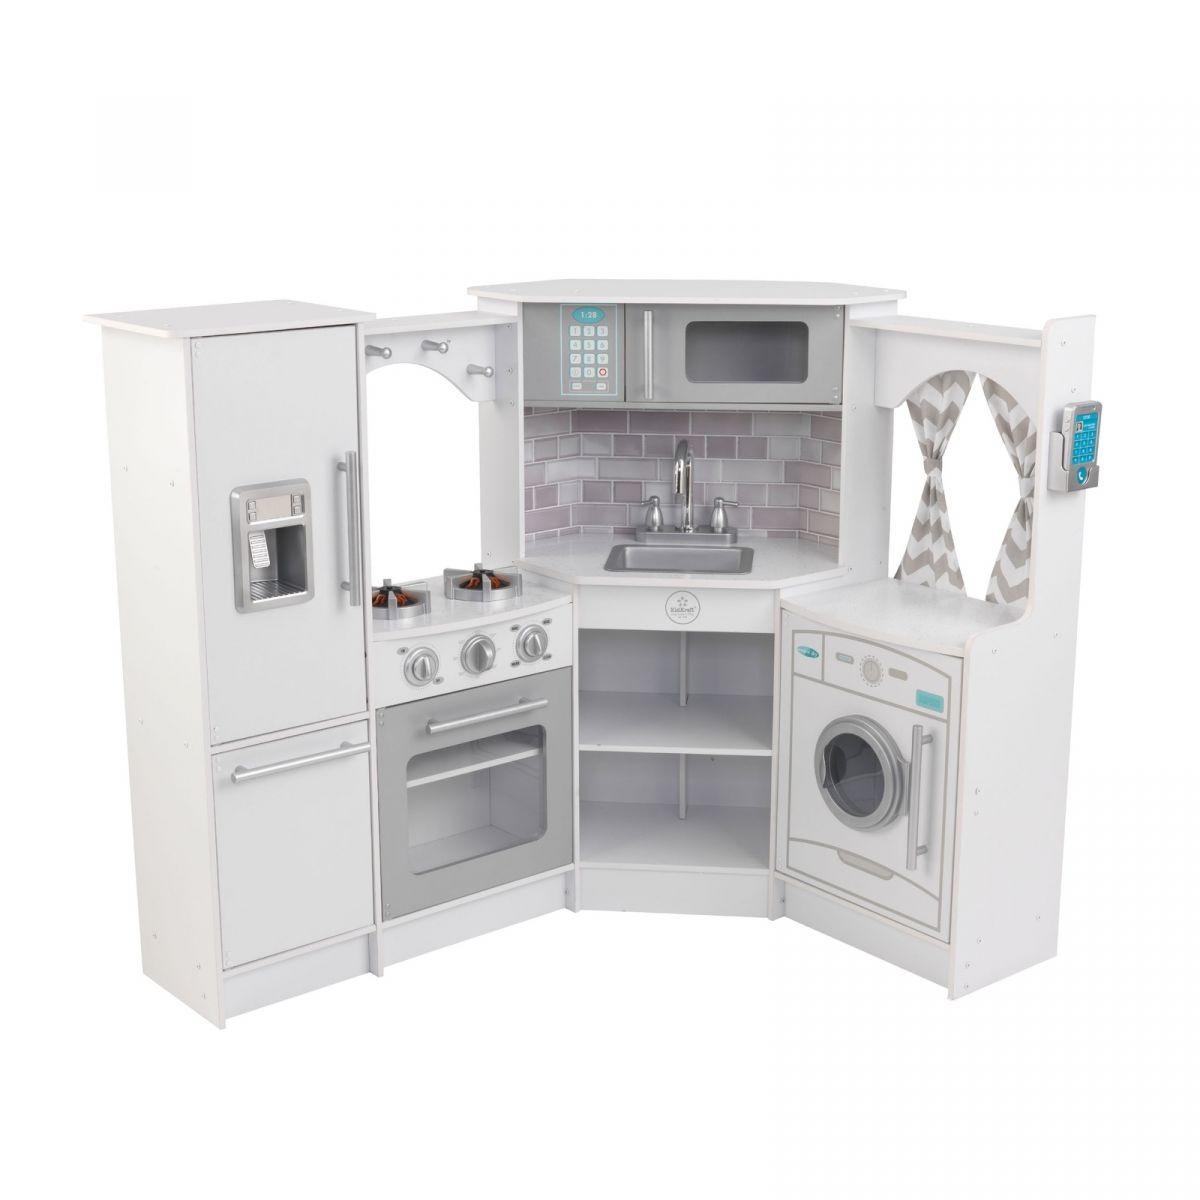 buy kidkraft - ultimate corner play kitchen set w/ lights